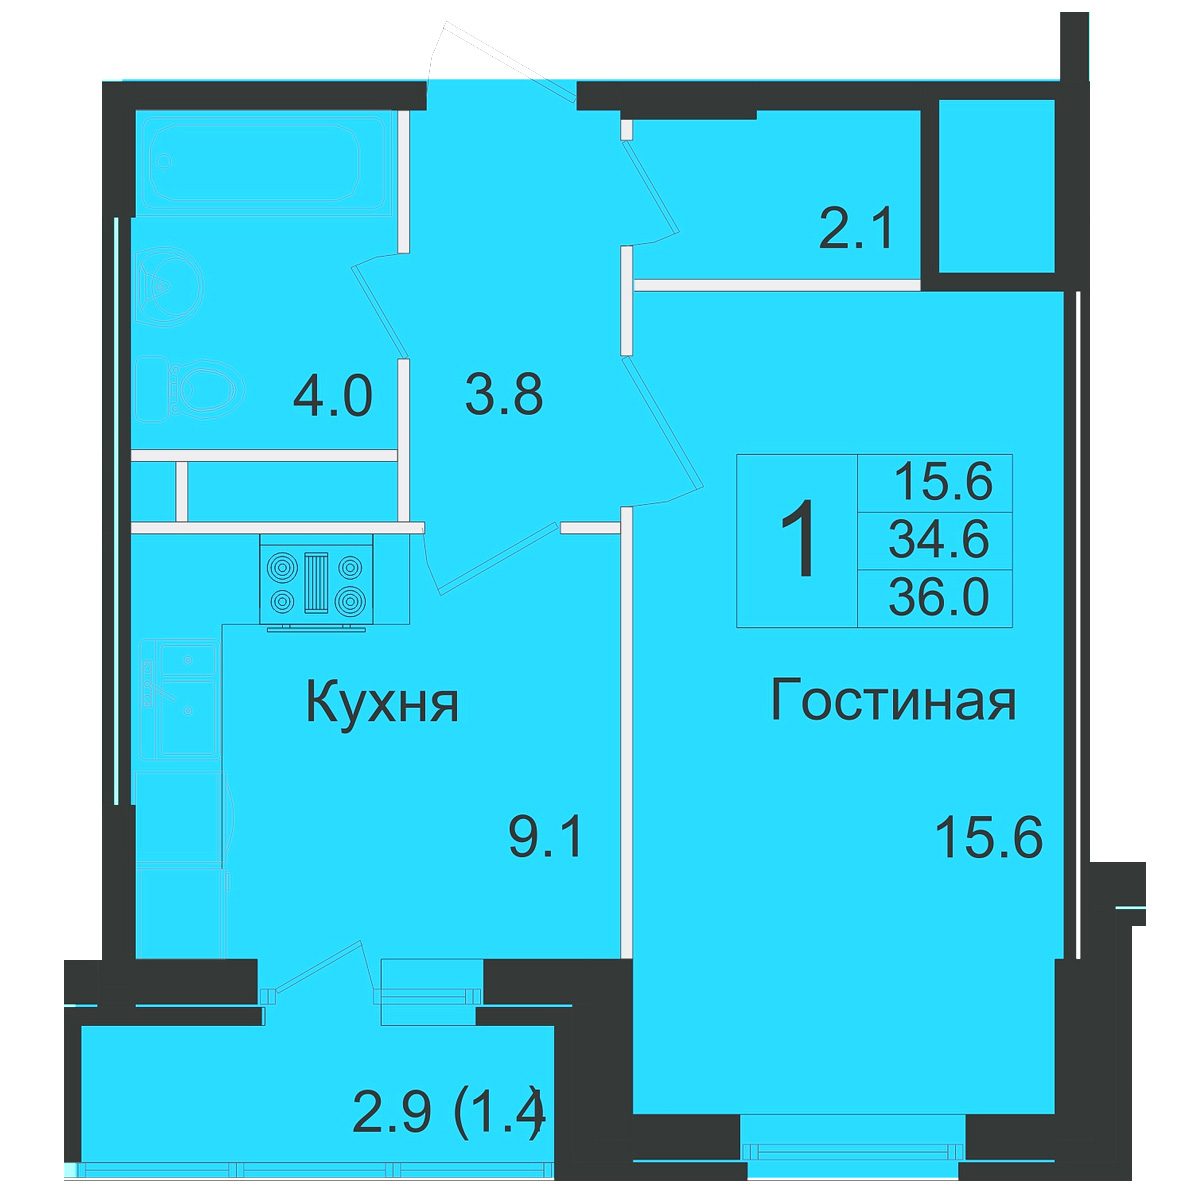 План 1-комн. 36.0 м²